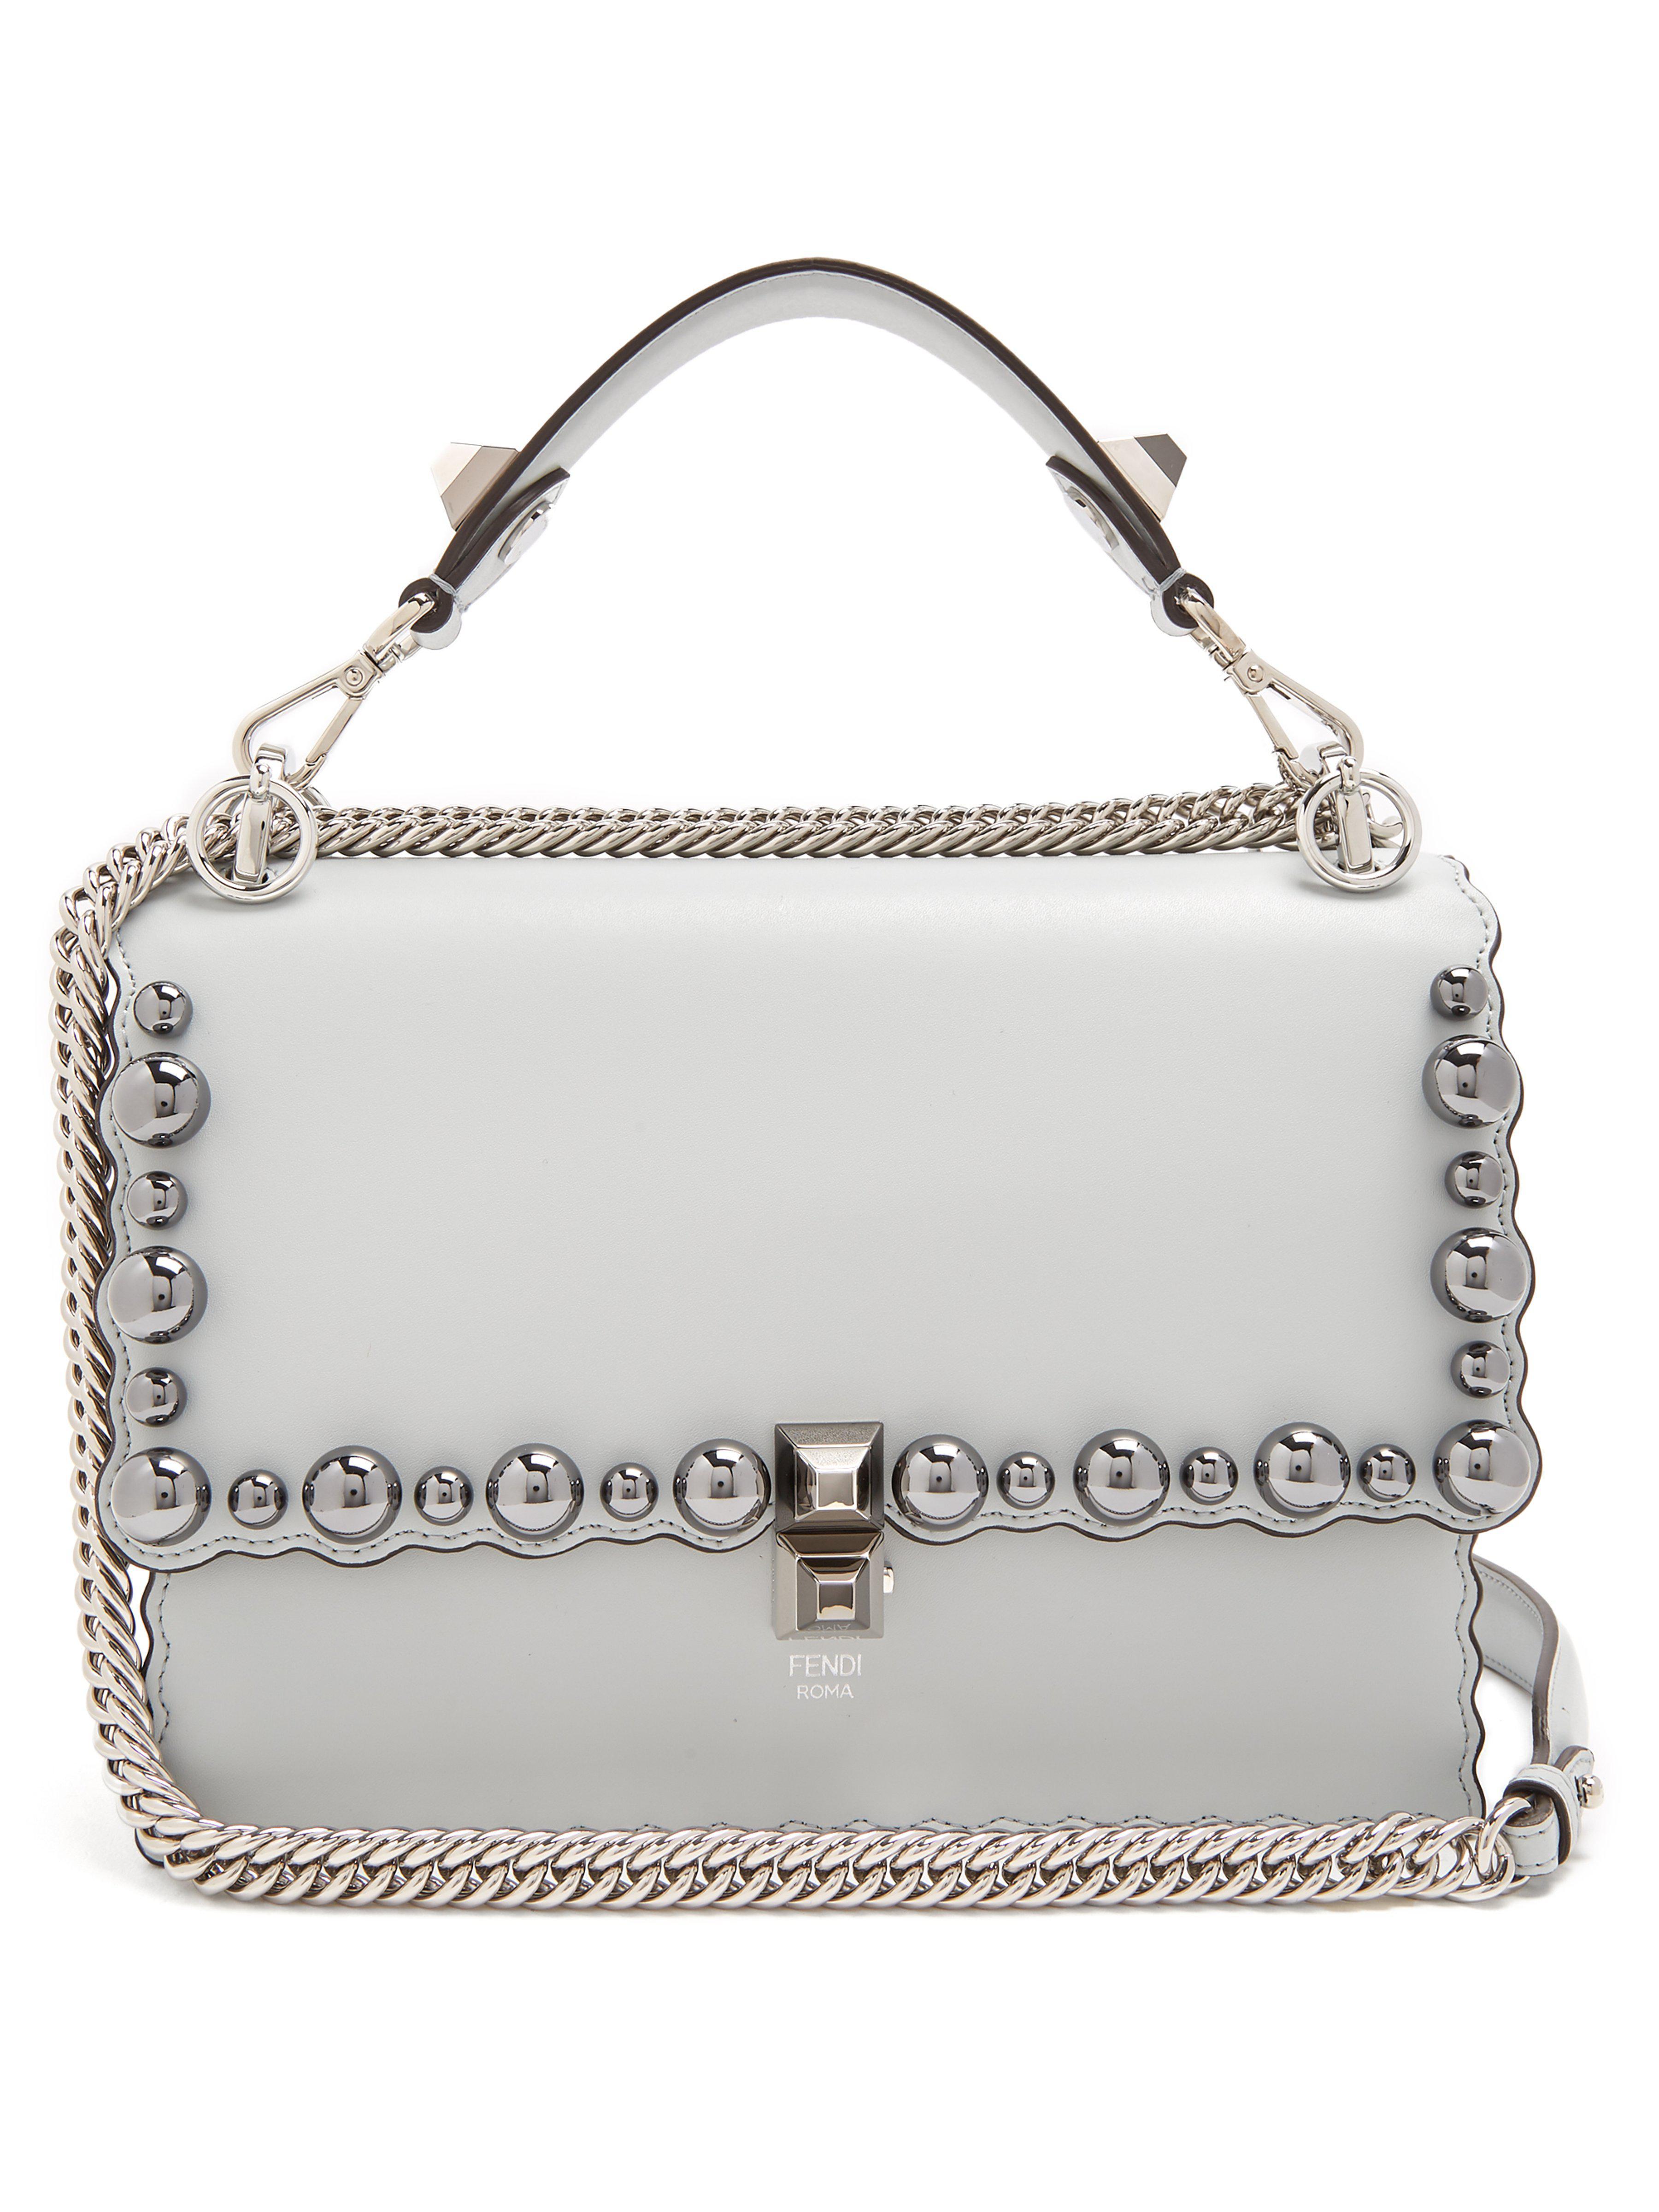 5340b14e6bd4 Fendi Kan I Leather Cross Body Bag in Blue - Lyst